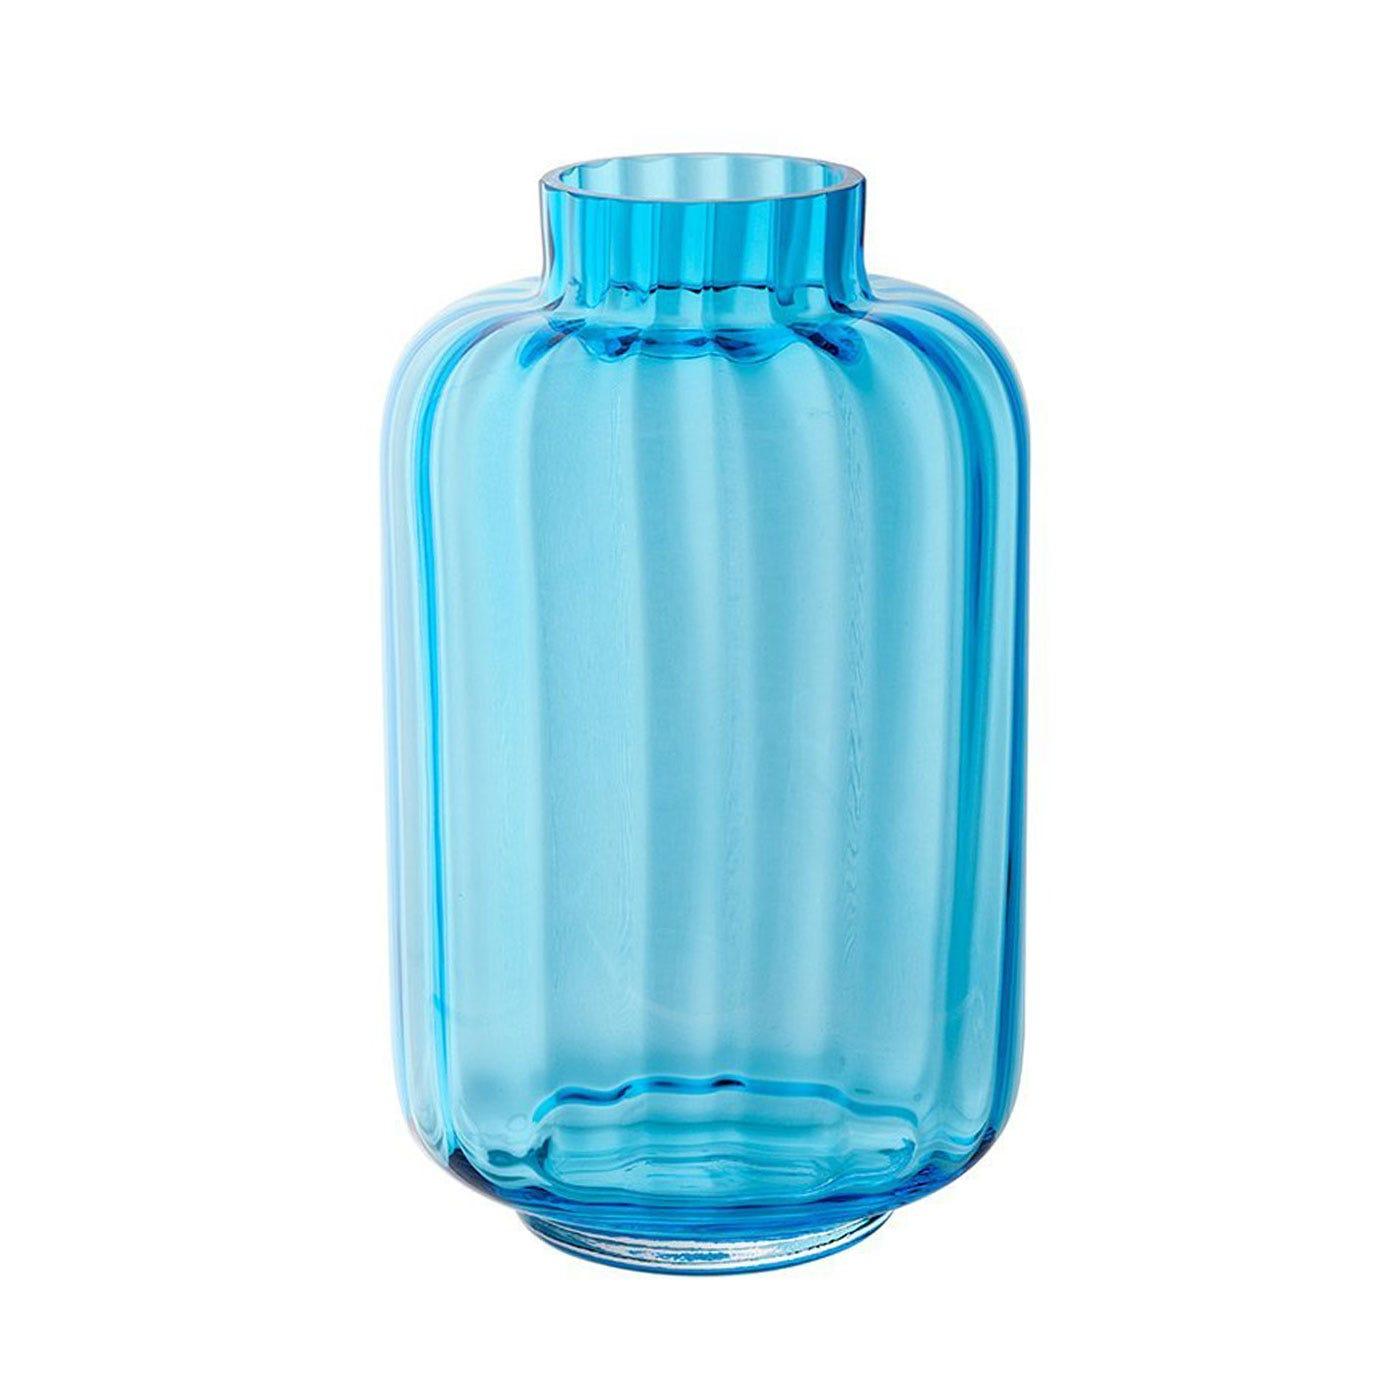 Lantern Turquoise Vase